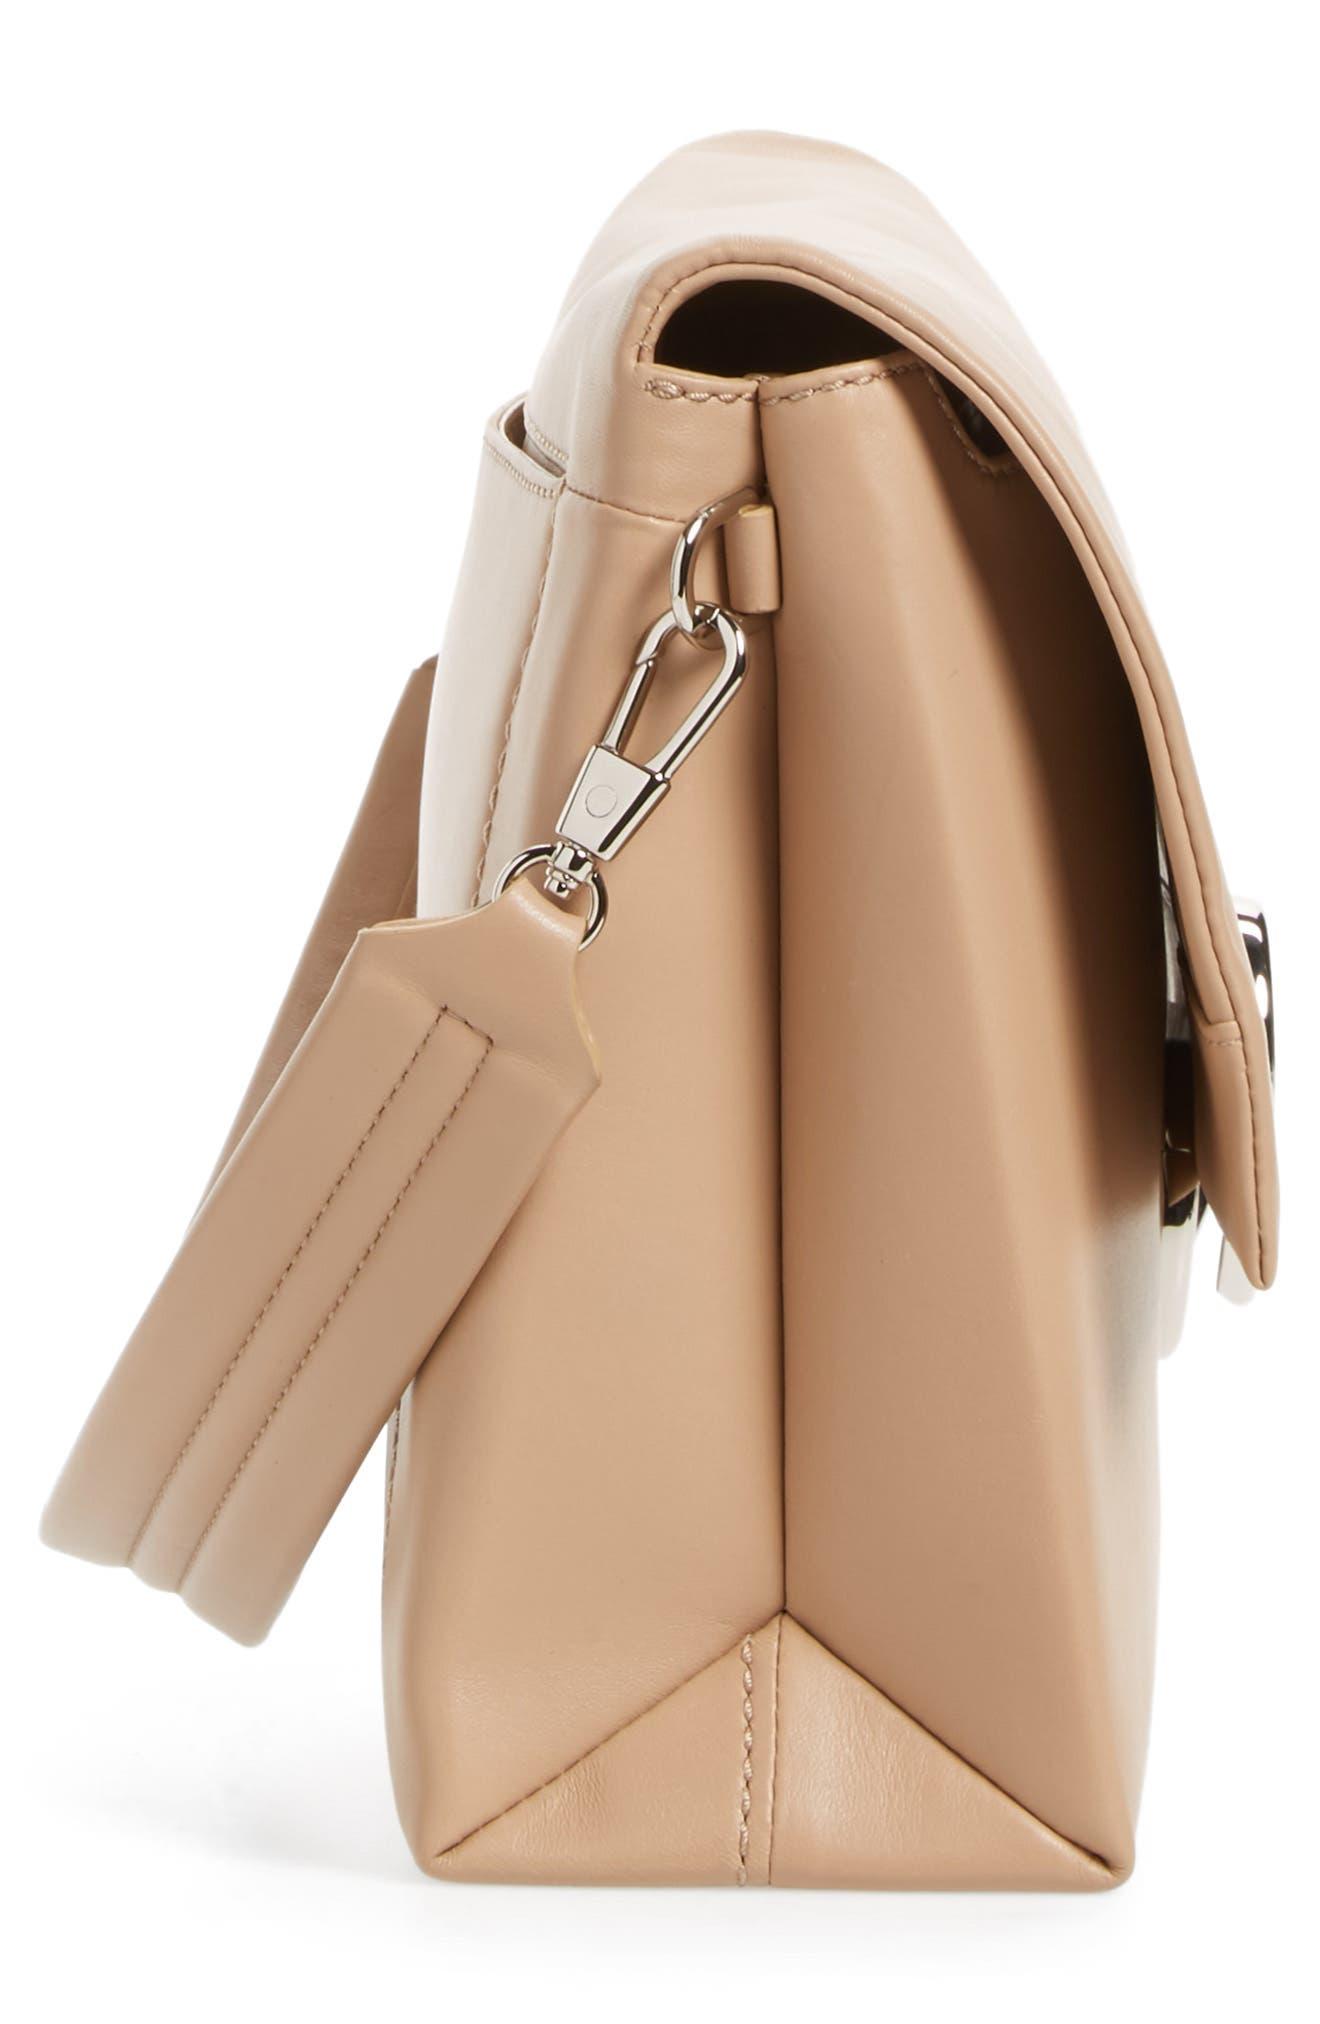 Oversized Alix Flap Leather Shoulder Bag,                             Alternate thumbnail 6, color,                             260